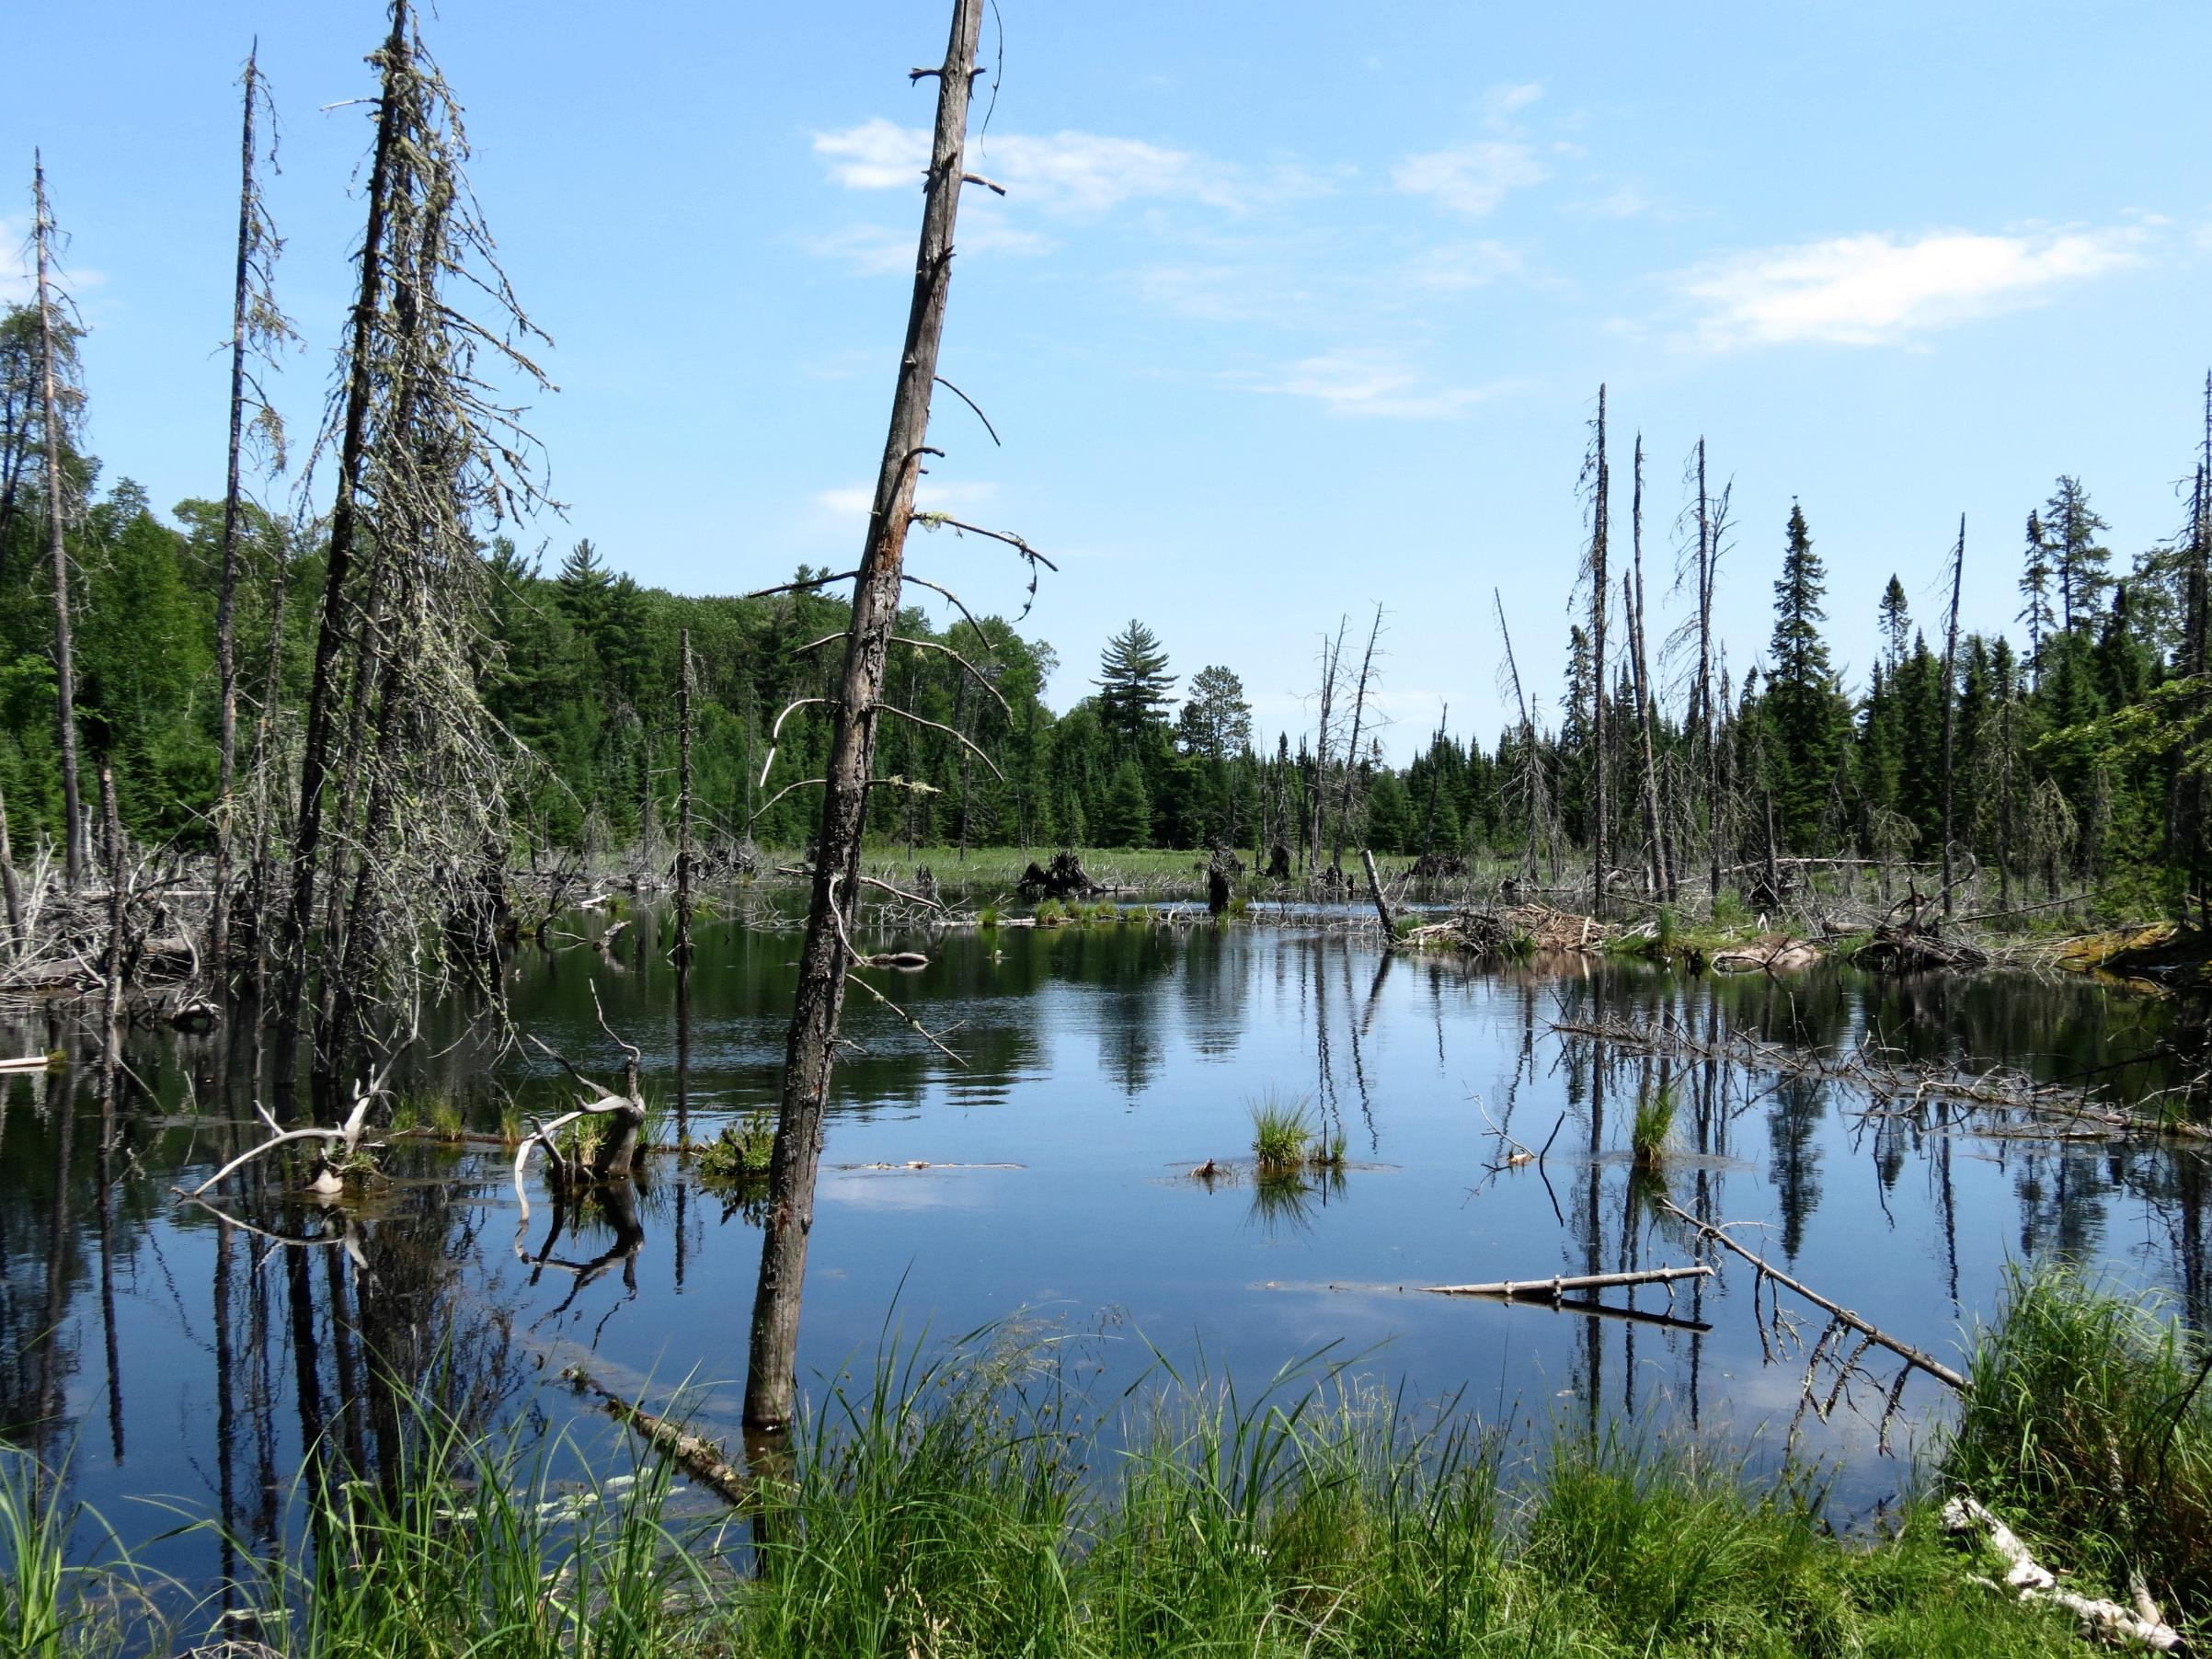 zc. Beaver pond along Ruby/Lynx portage